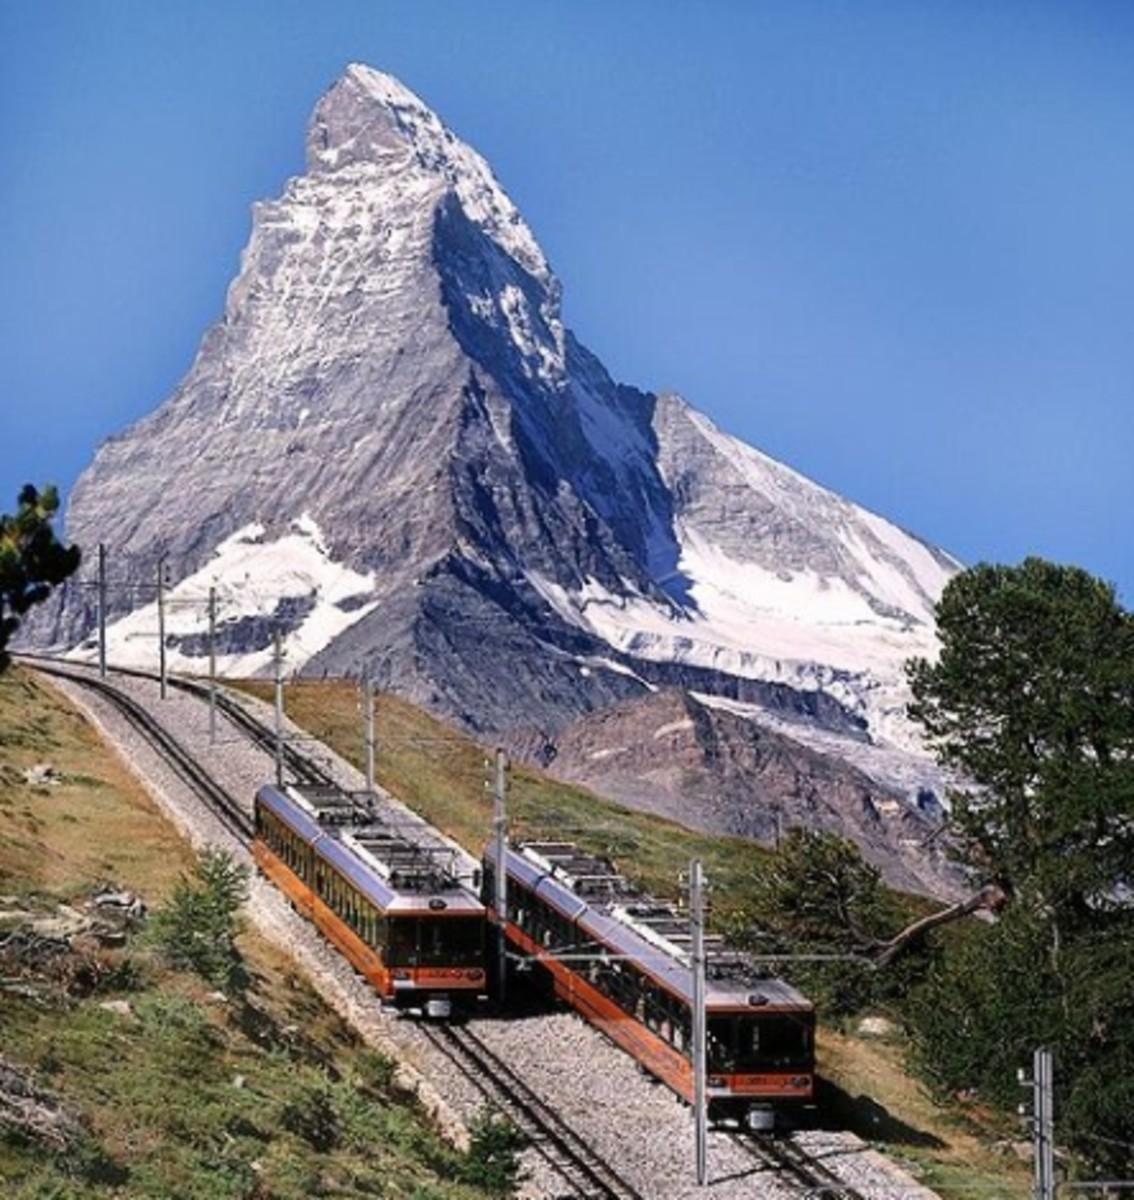 The Gornergrat cog railway and the Matterhorn today